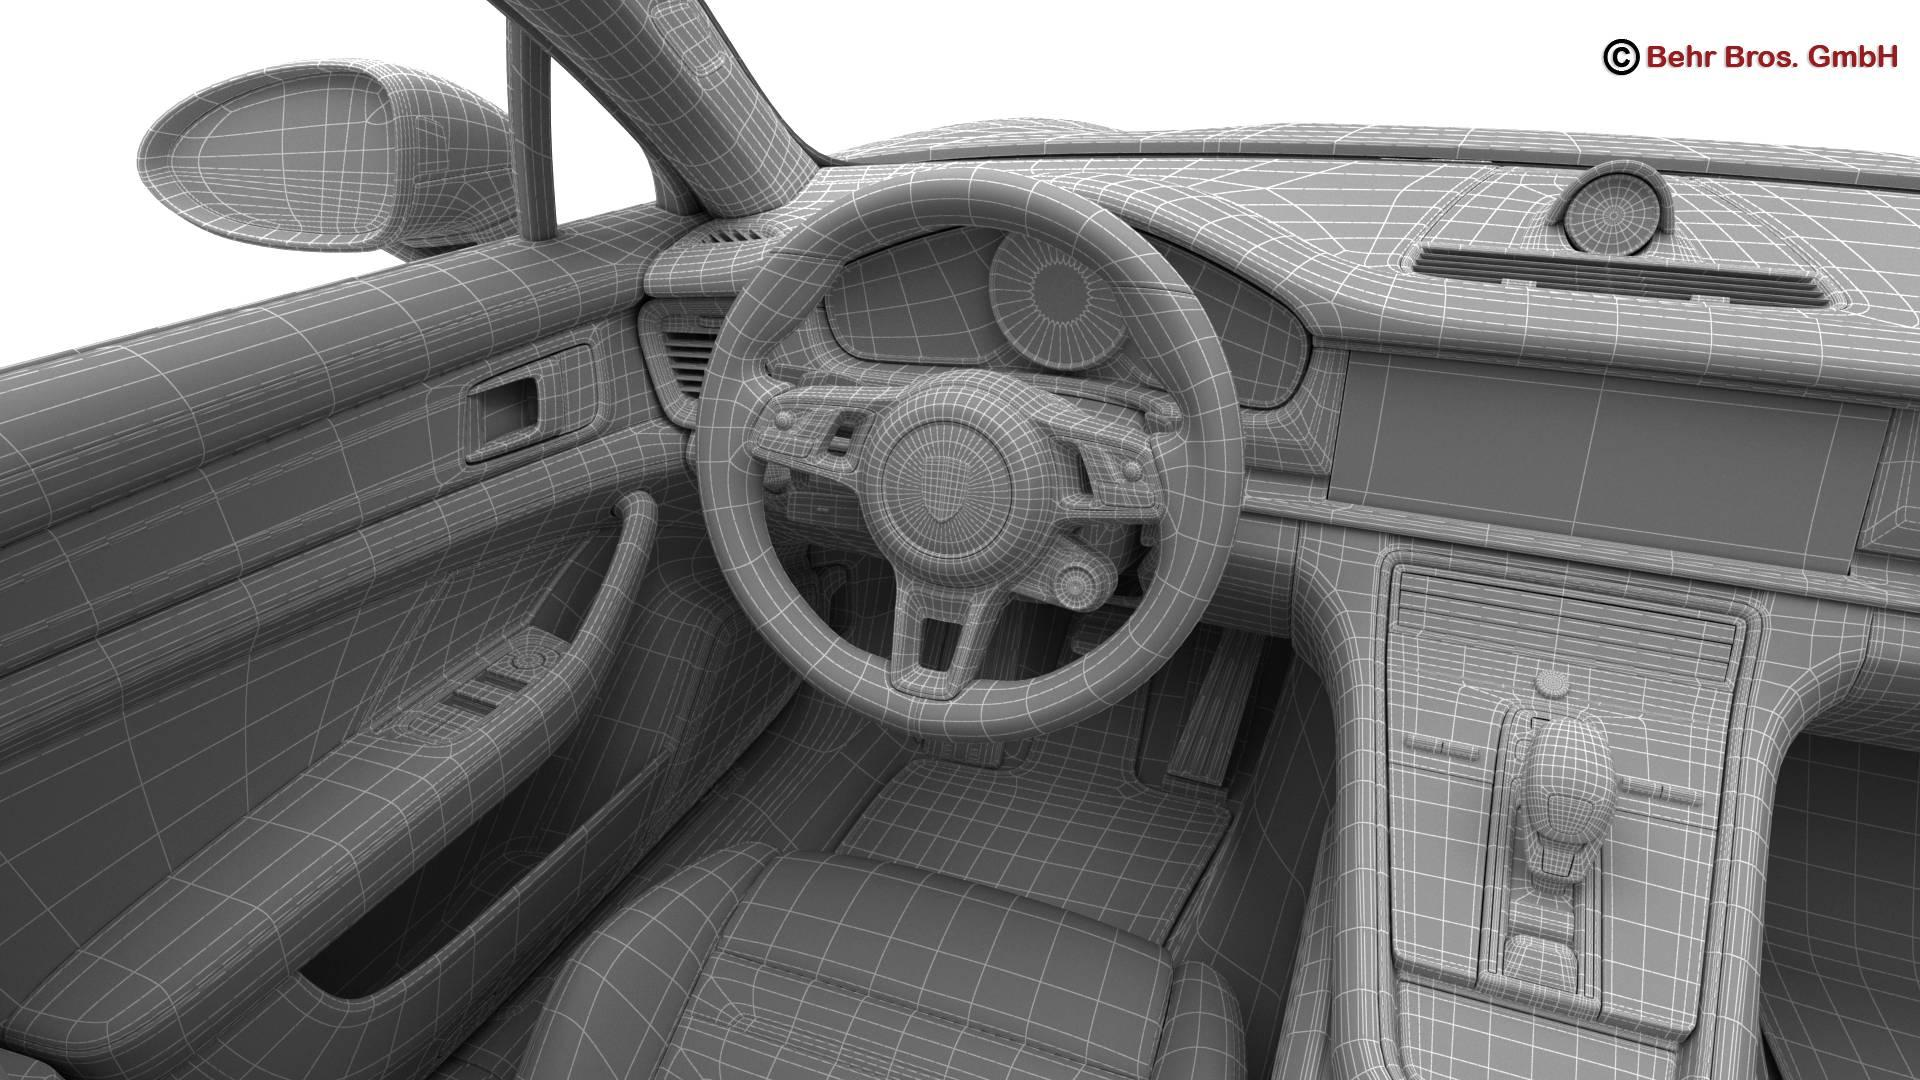 porsche panamera sport turismo turbo 2018 3d model 3ds max fbx c4d lwo ma mb obj 252527